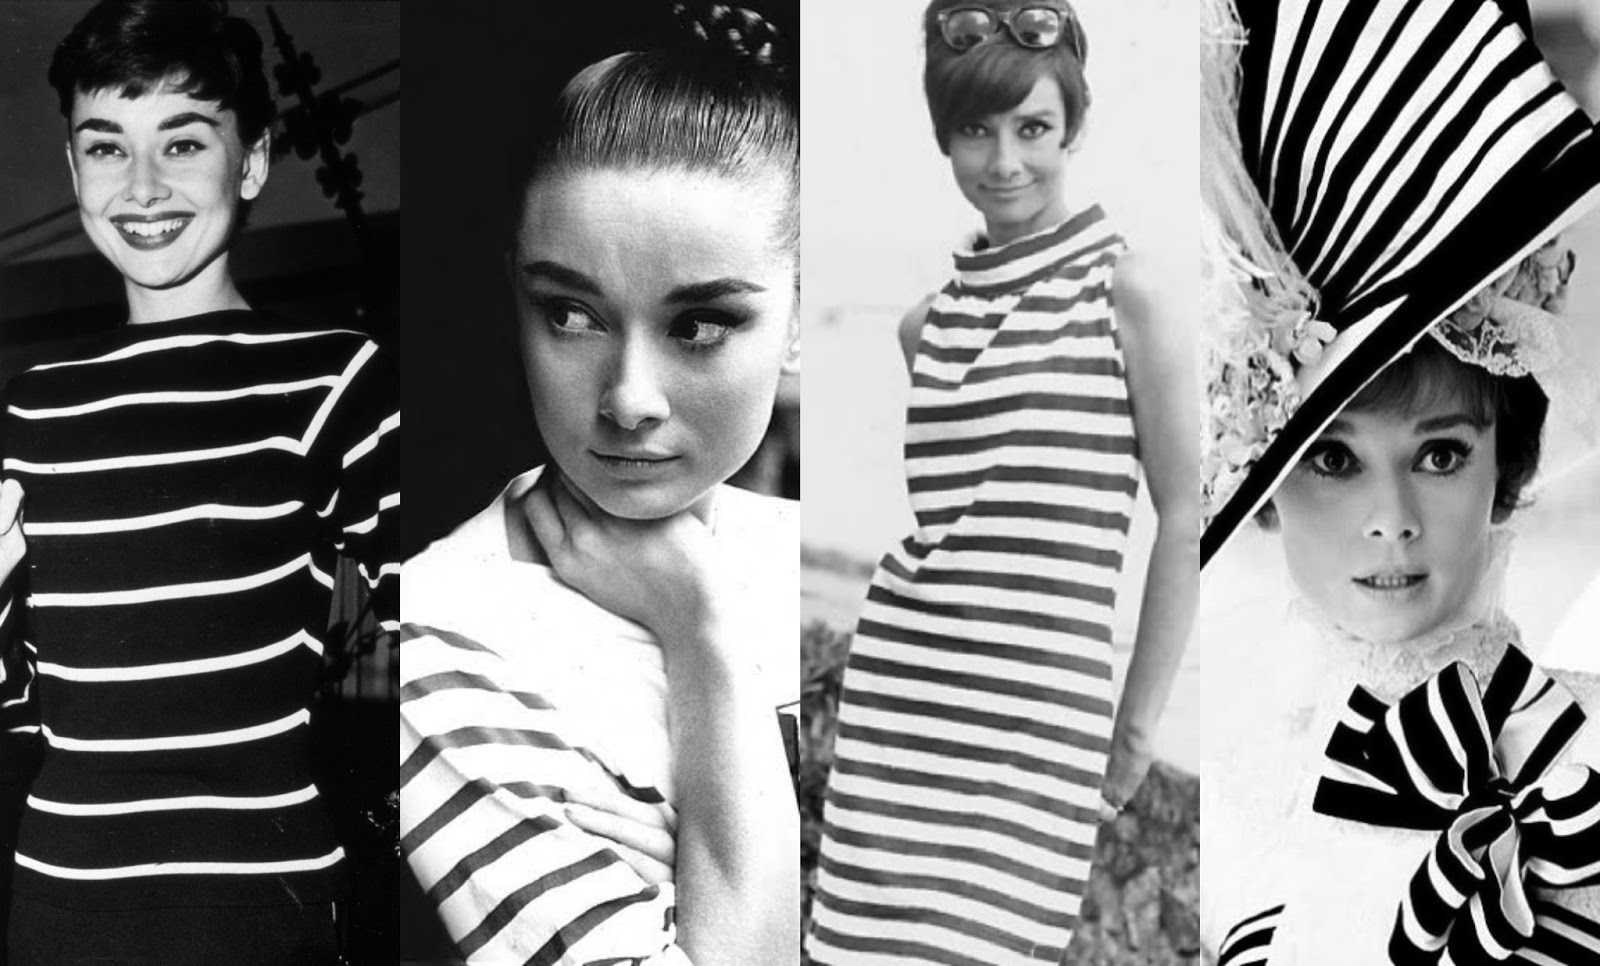 audrey-hepburn-stripes-clothing.jpg